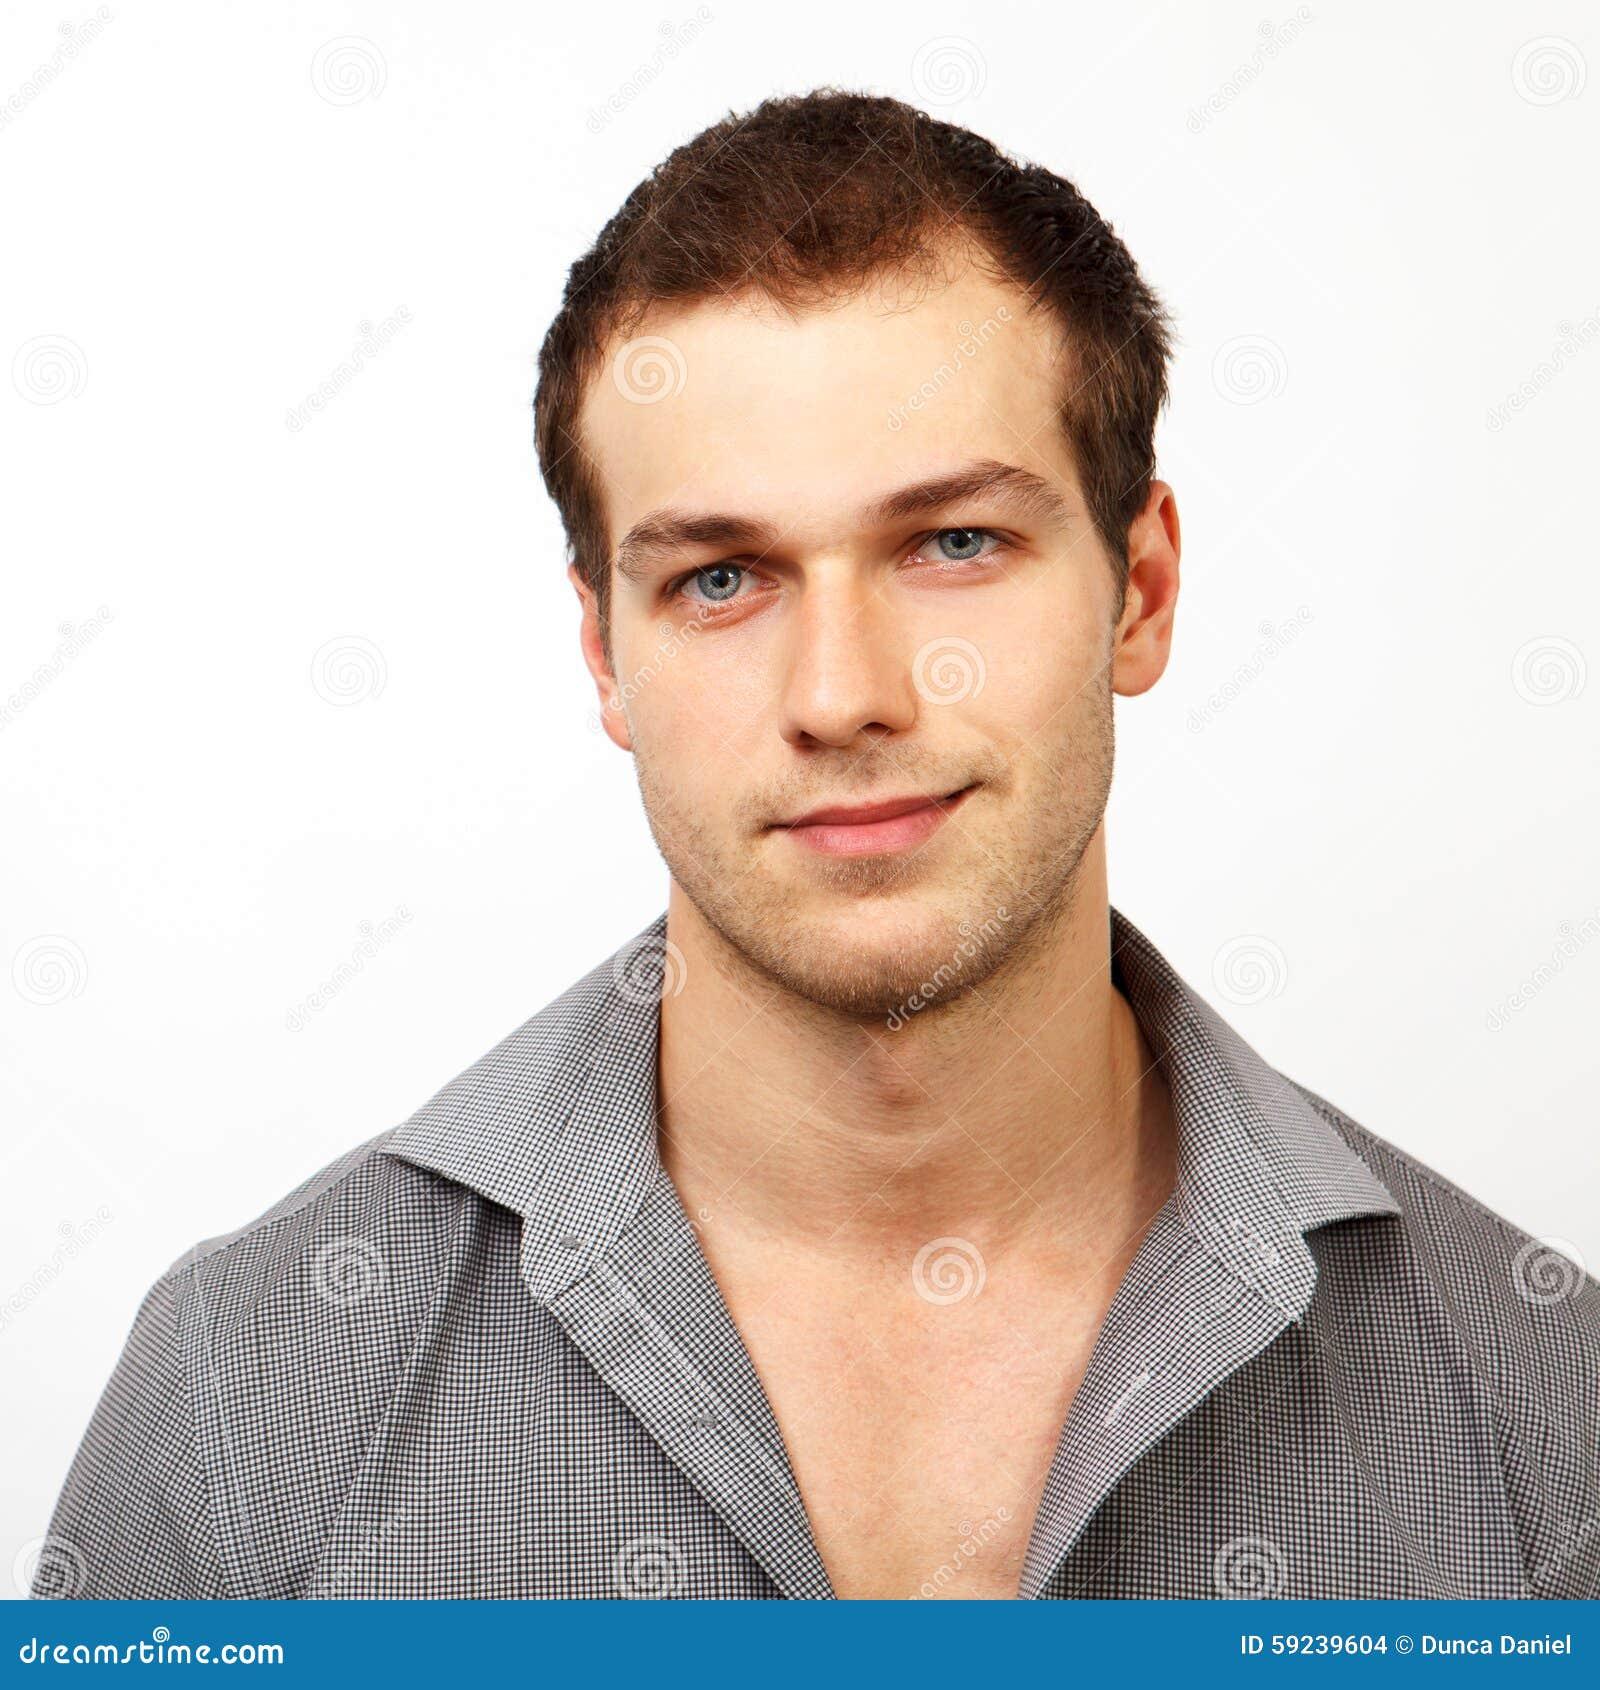 nice male photos